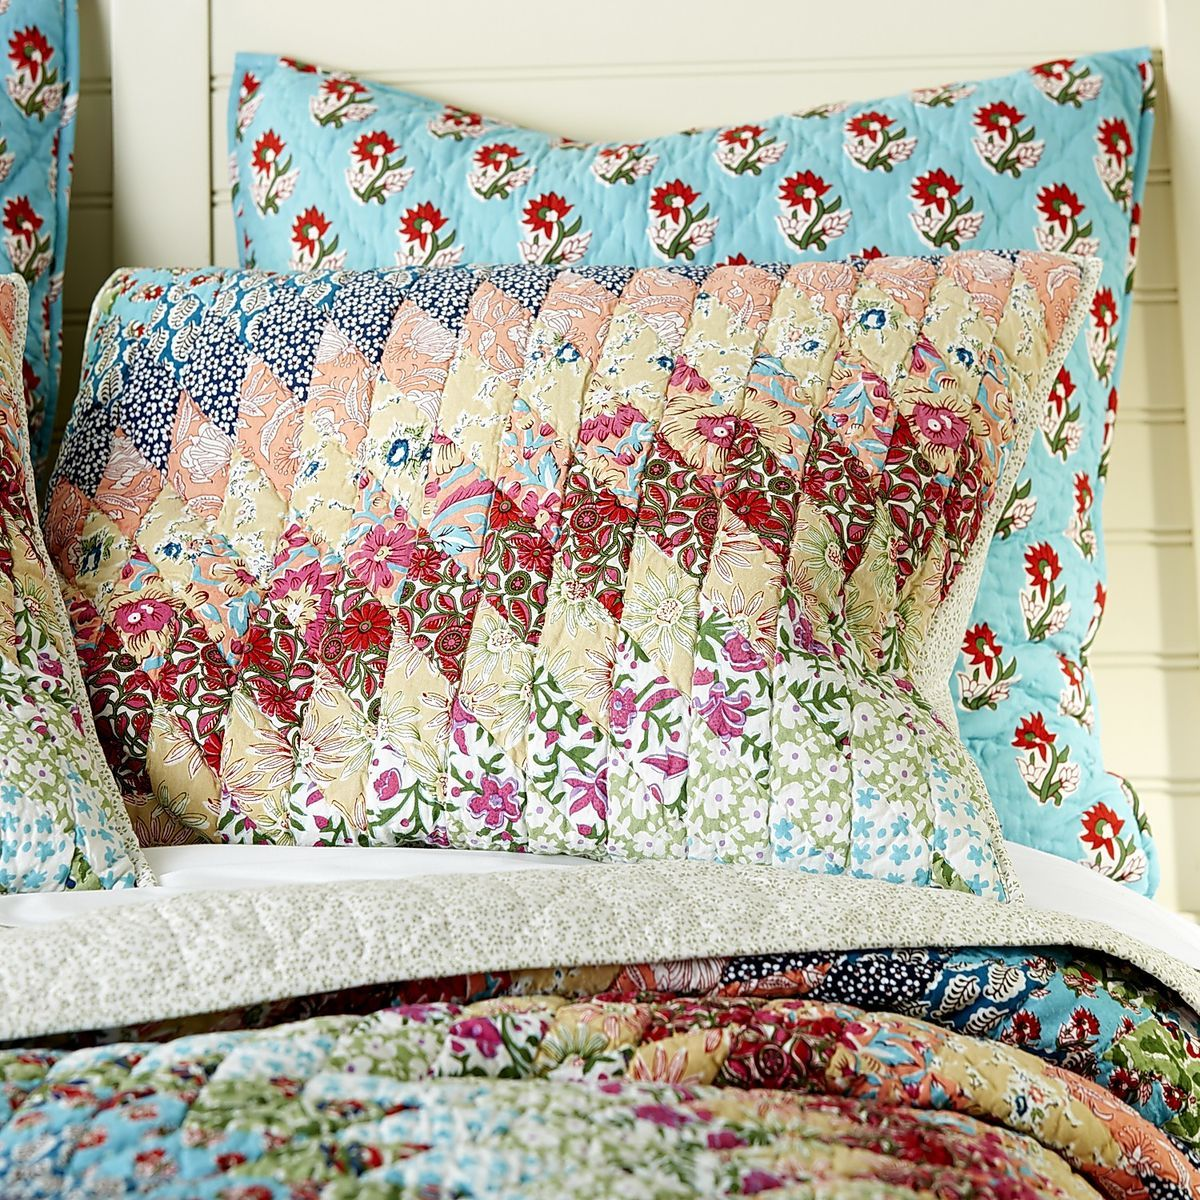 Starburst Quilt & Sham - Multi | Pier 1 Imports | bedroom ... : pier one quilts - Adamdwight.com